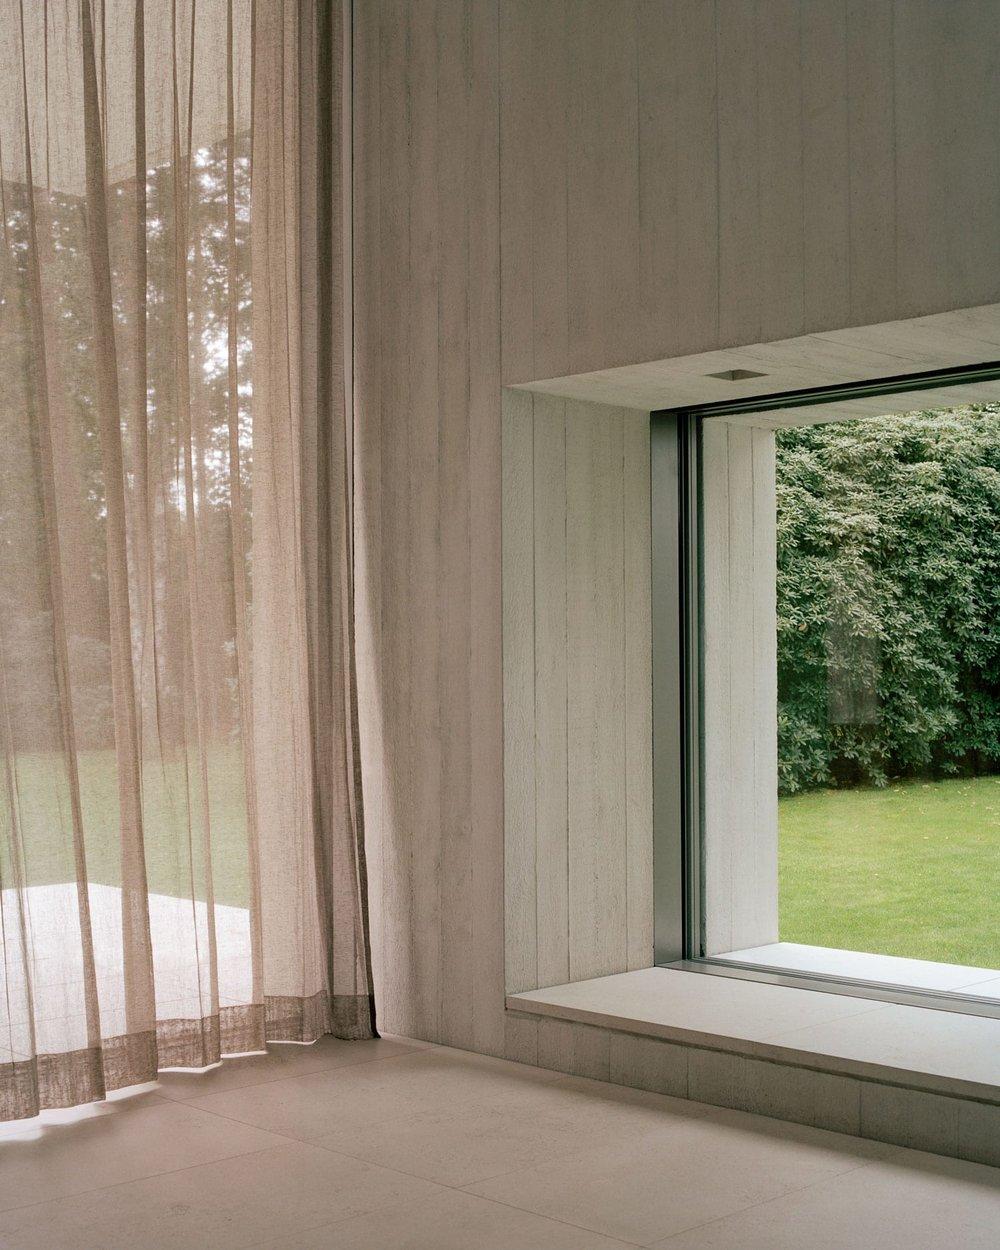 Villa-Waalre-Eindhoven-by-Russell-Jones-Room on Fire-18.jpg